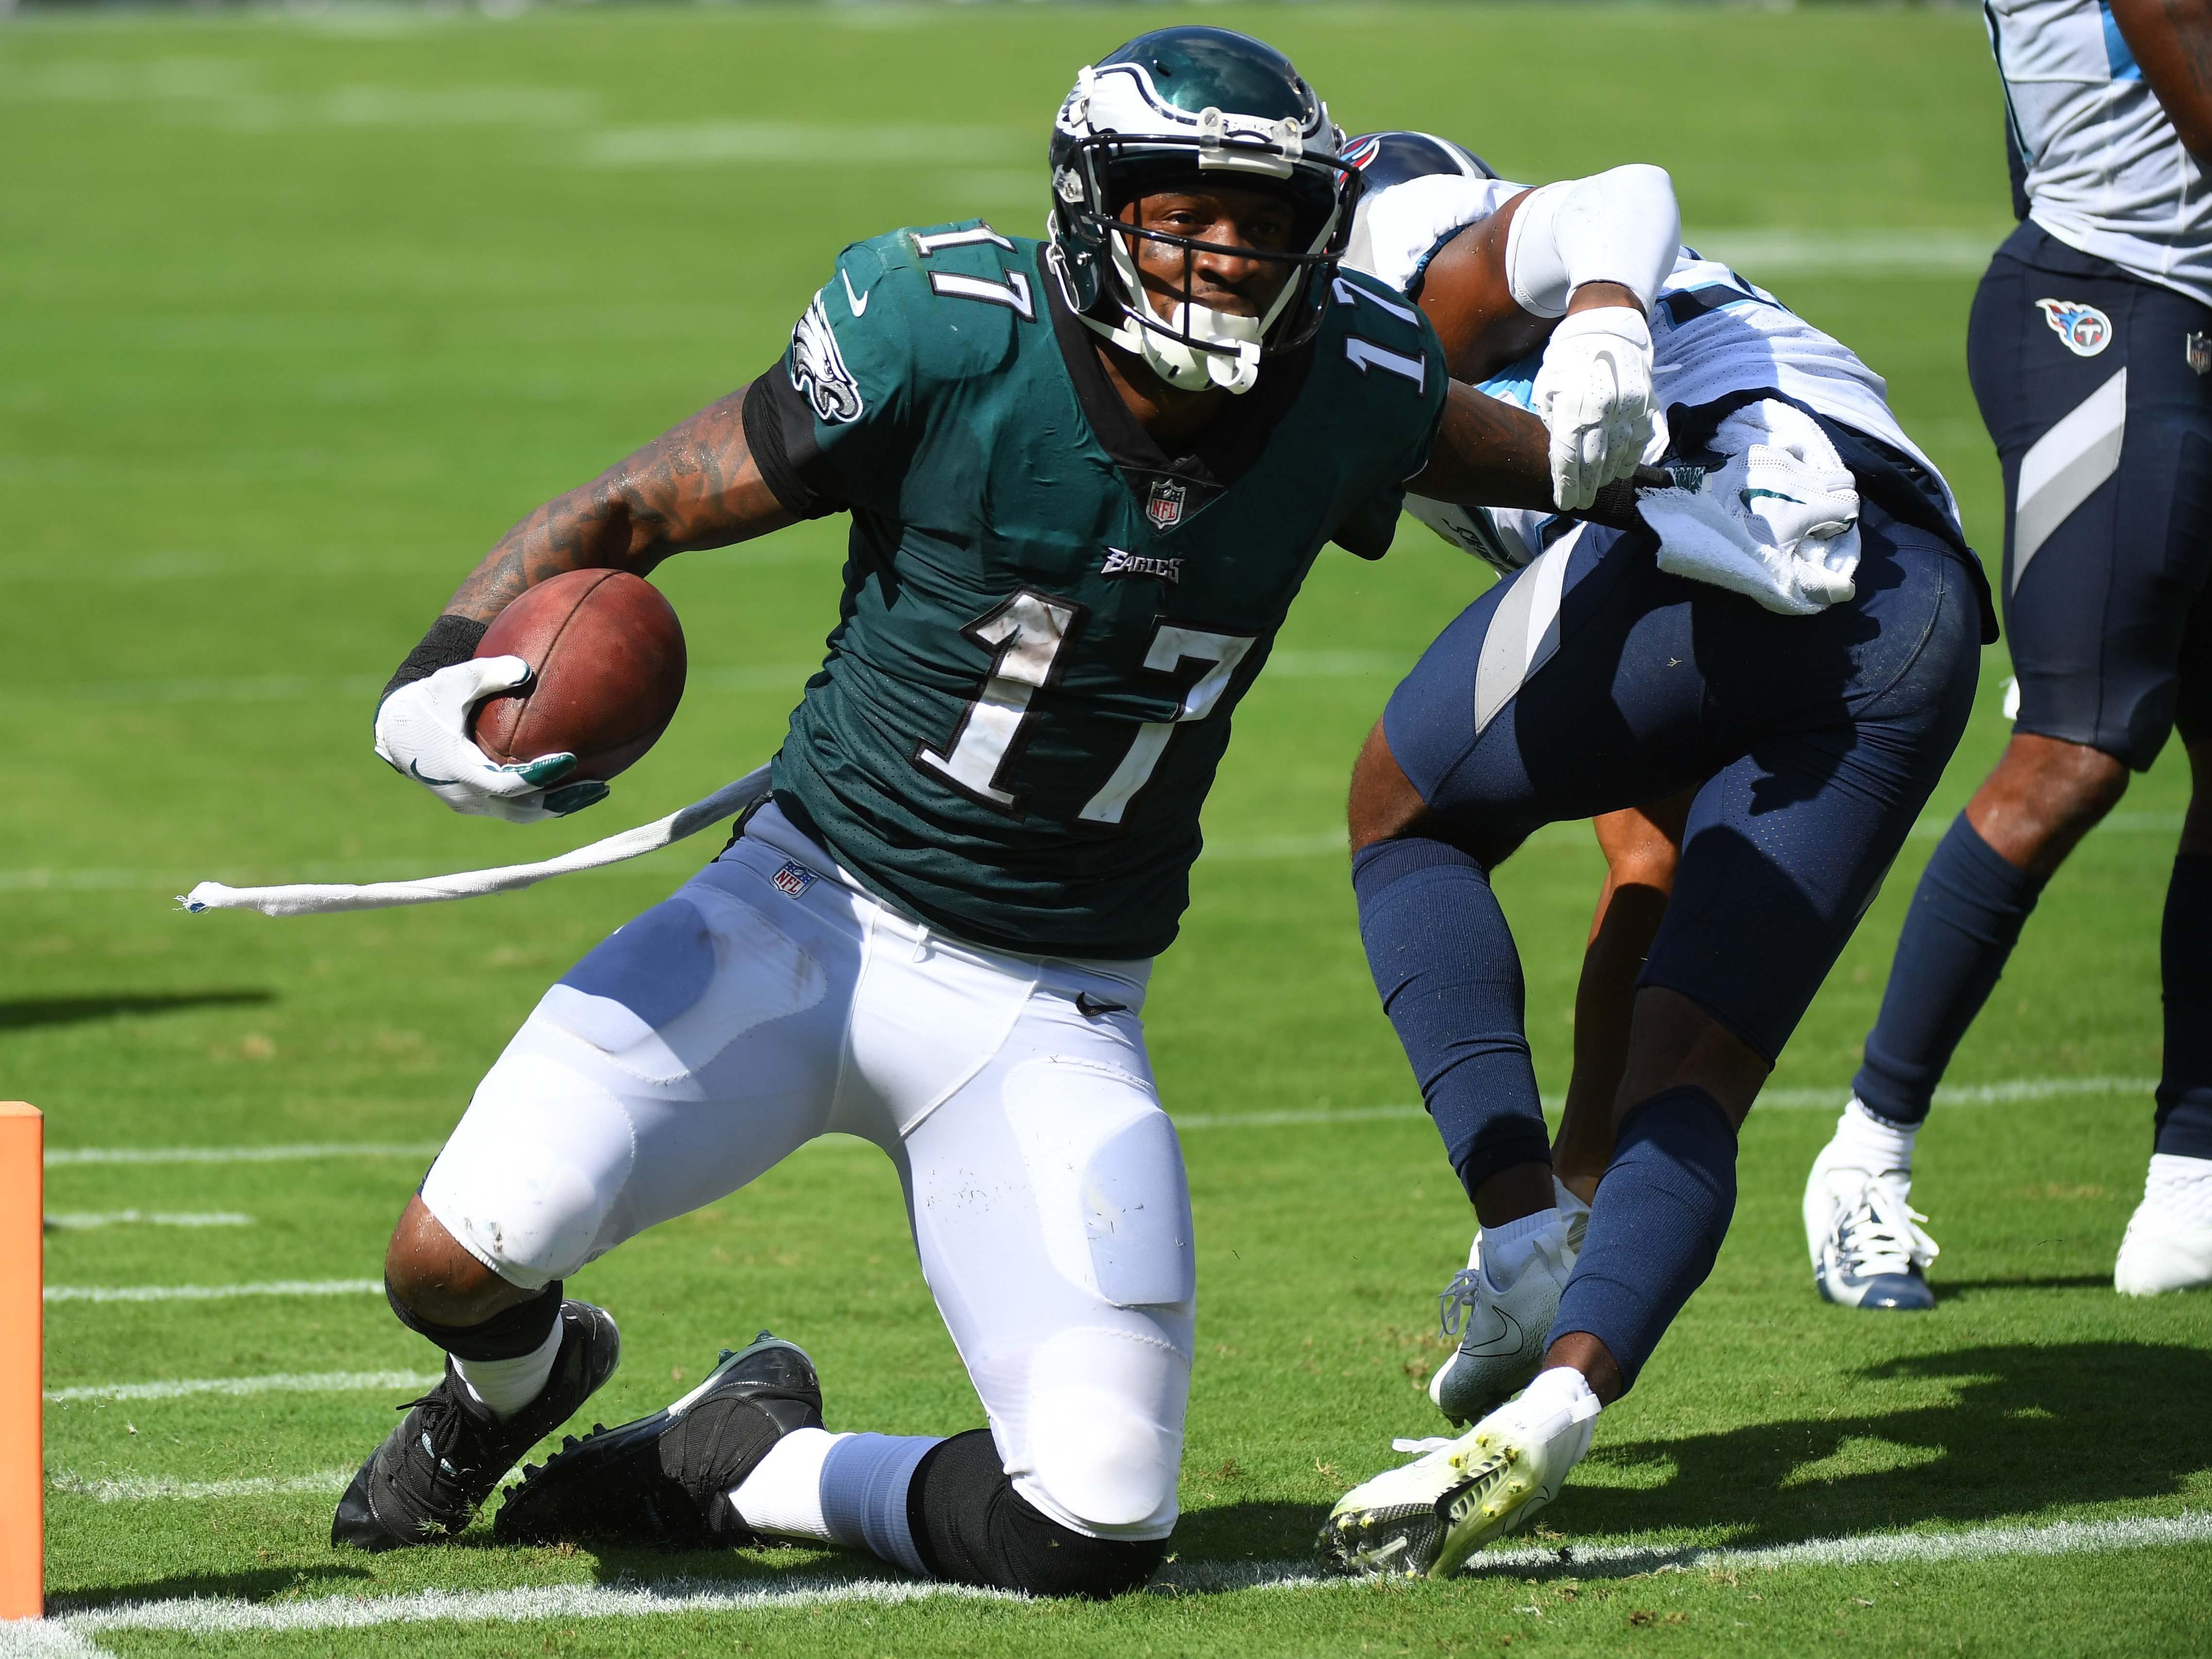 Eagles wide receiver Alshon Jeffery (17) celebrates after a touchdown against the Titans.